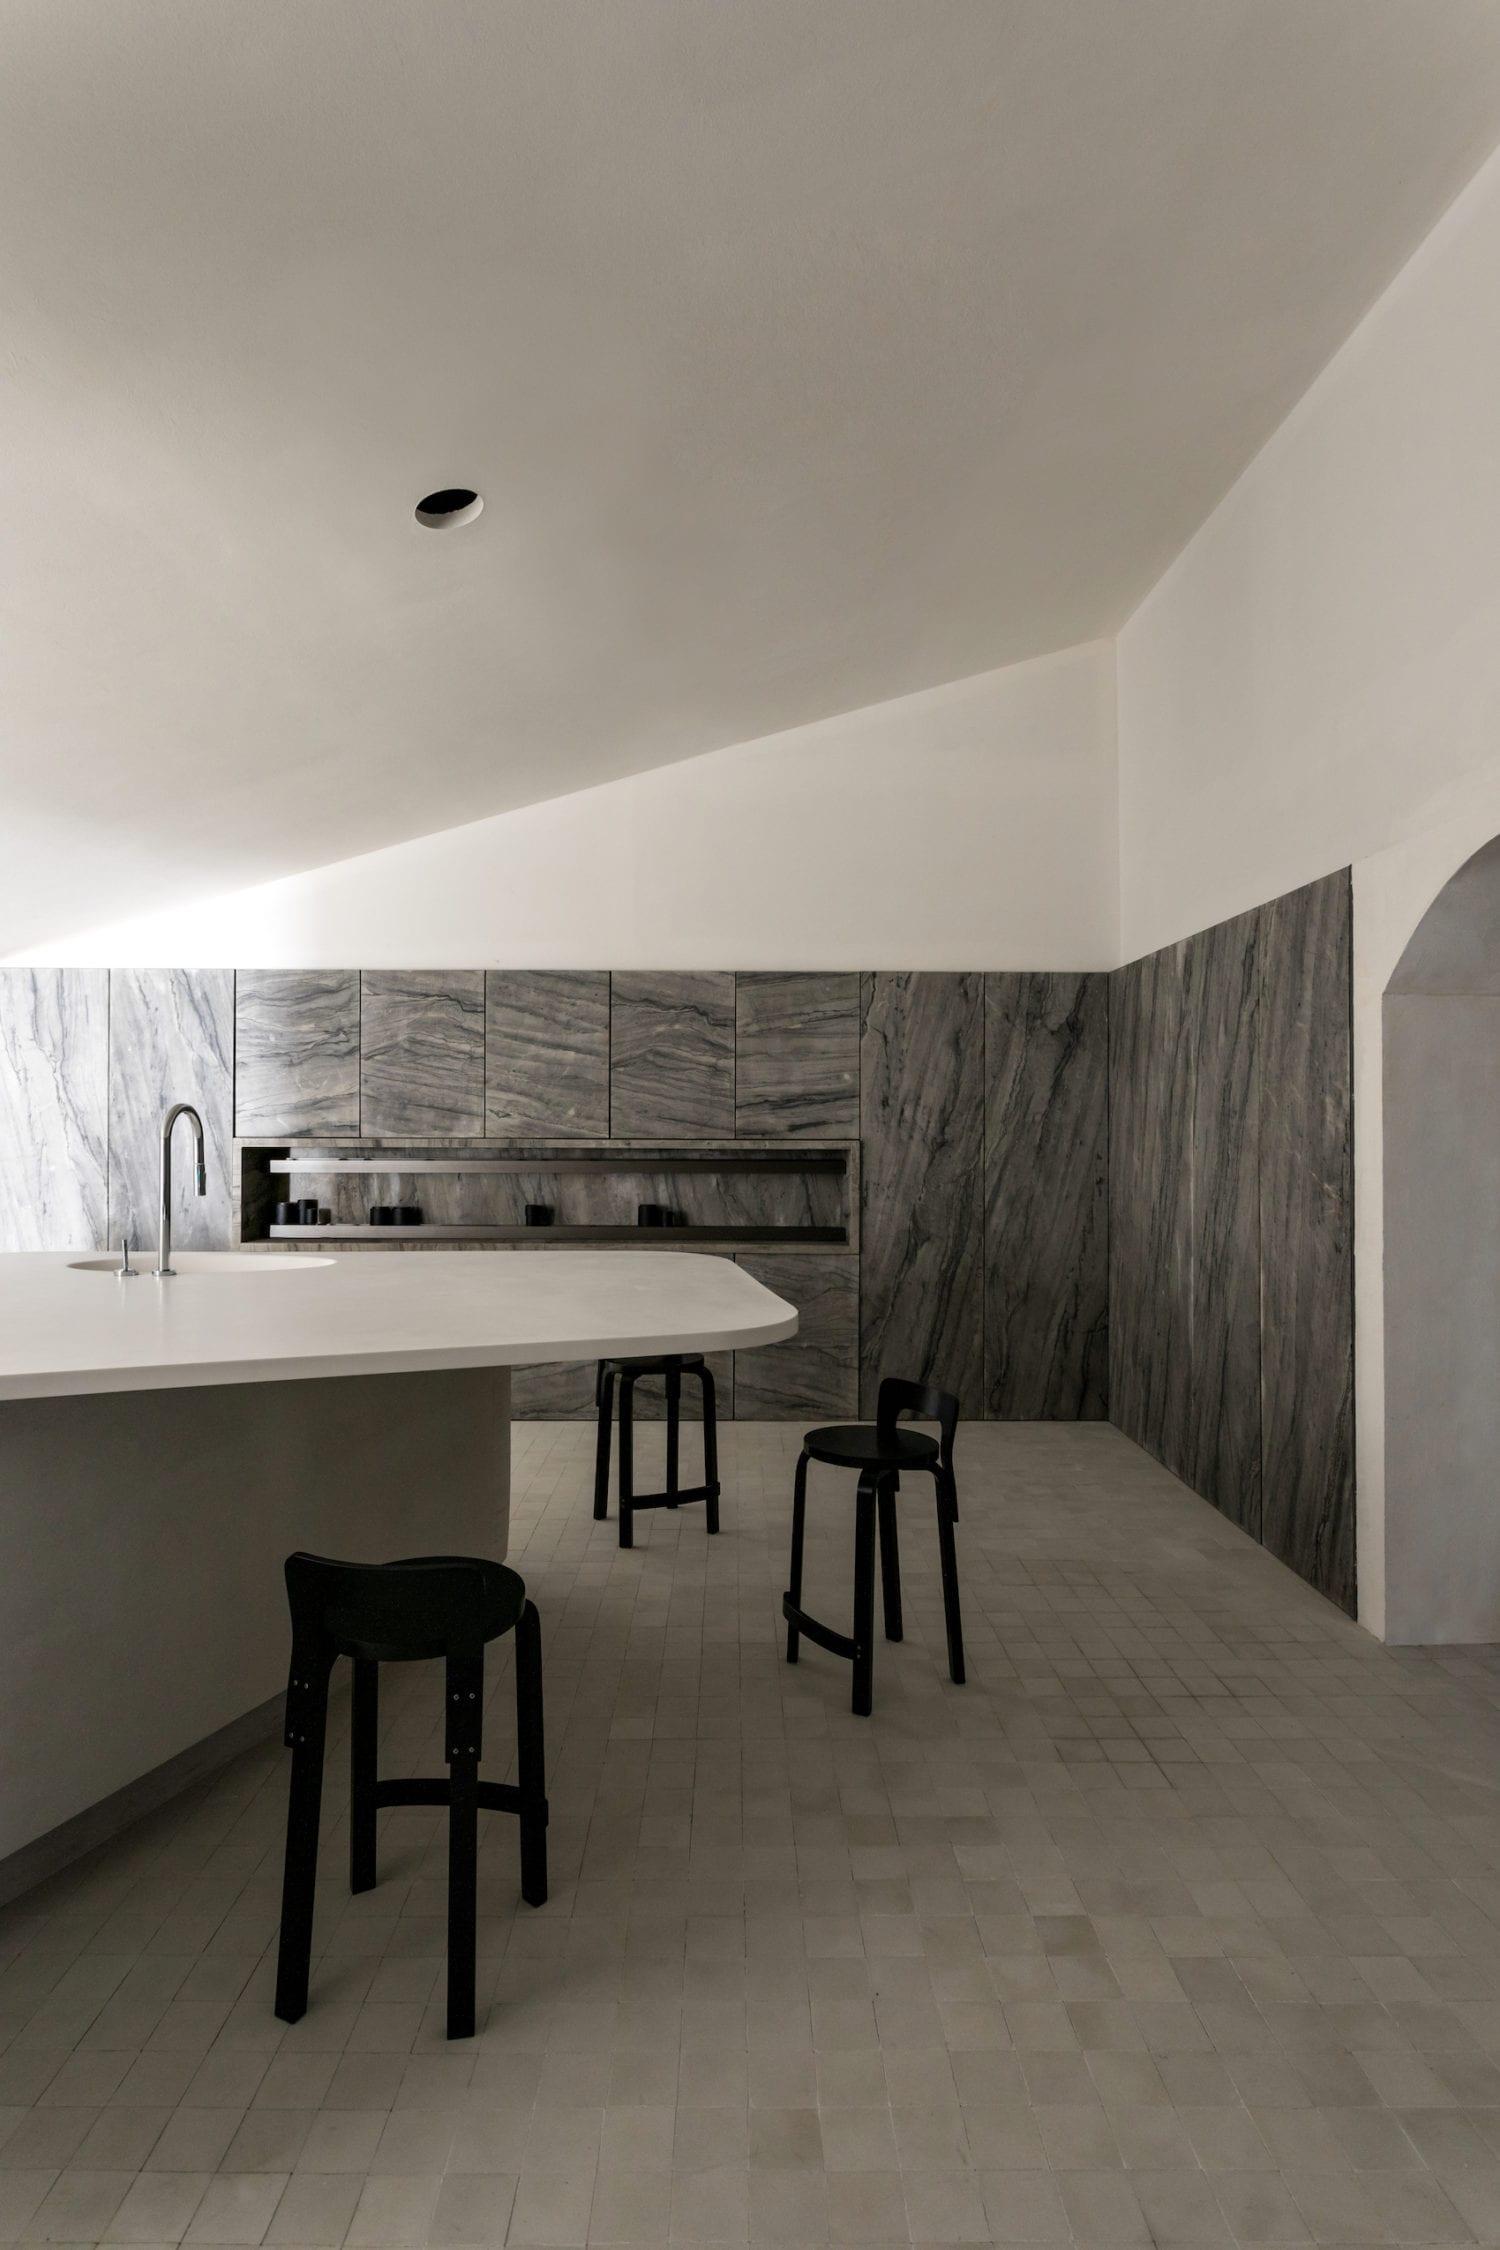 Cucina Pietra (Stone Kitchen) Concept in Sao Paulo by Felipe Hess | Yellowtrace